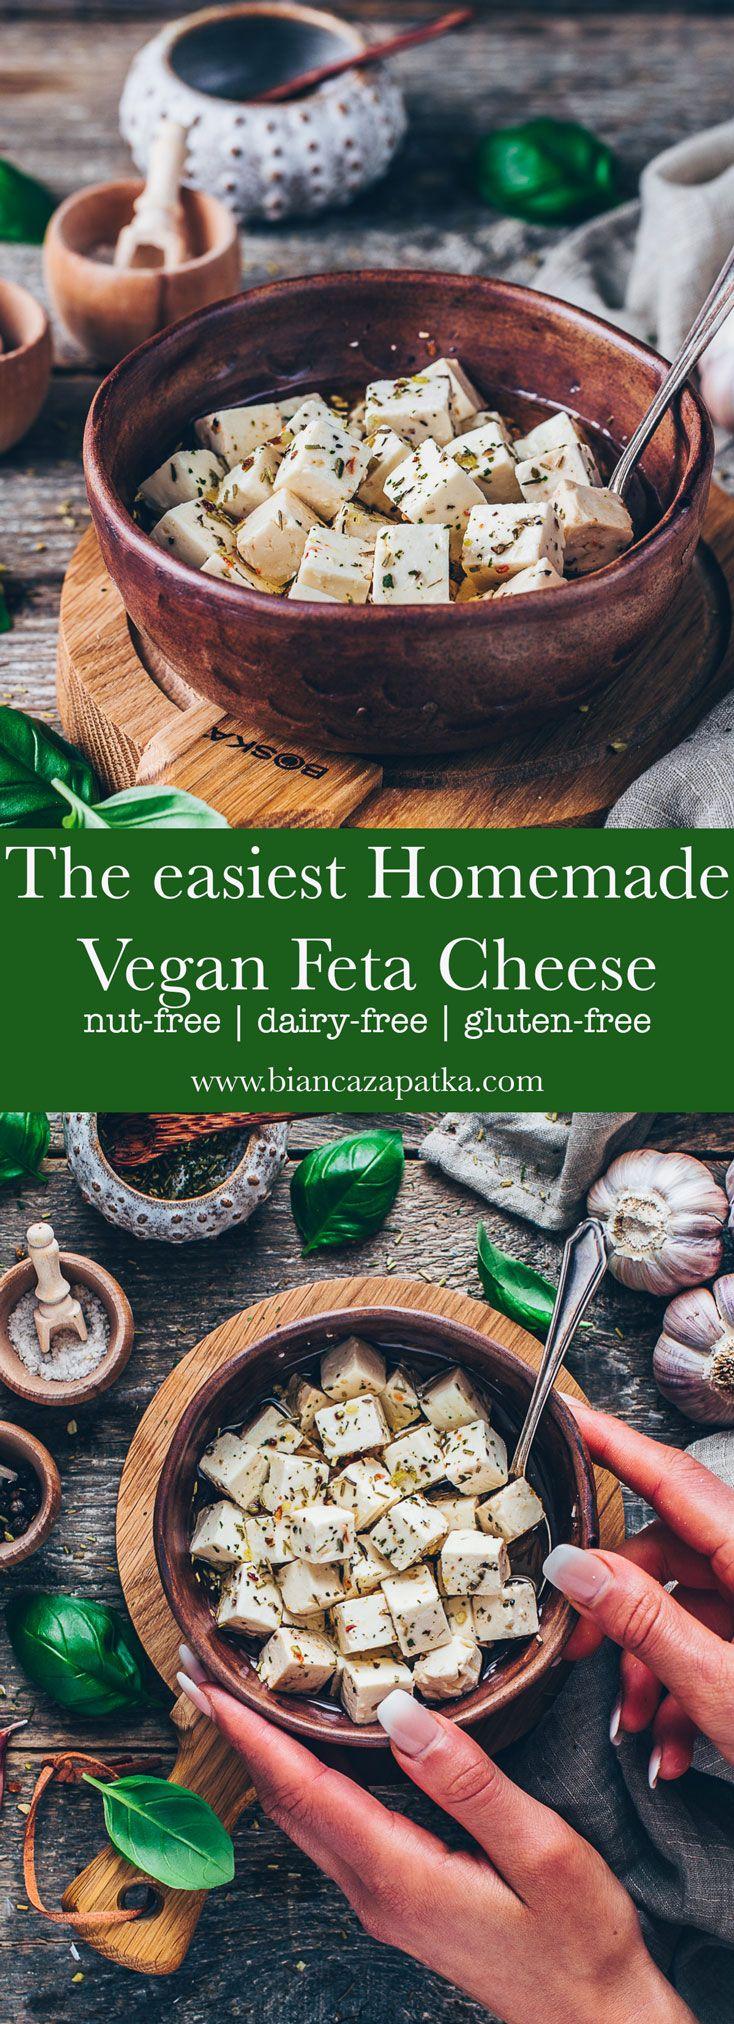 Vegan Feta Cheese Recipe   Easy, Dairy-free - Bianca Zapatka   Recipes